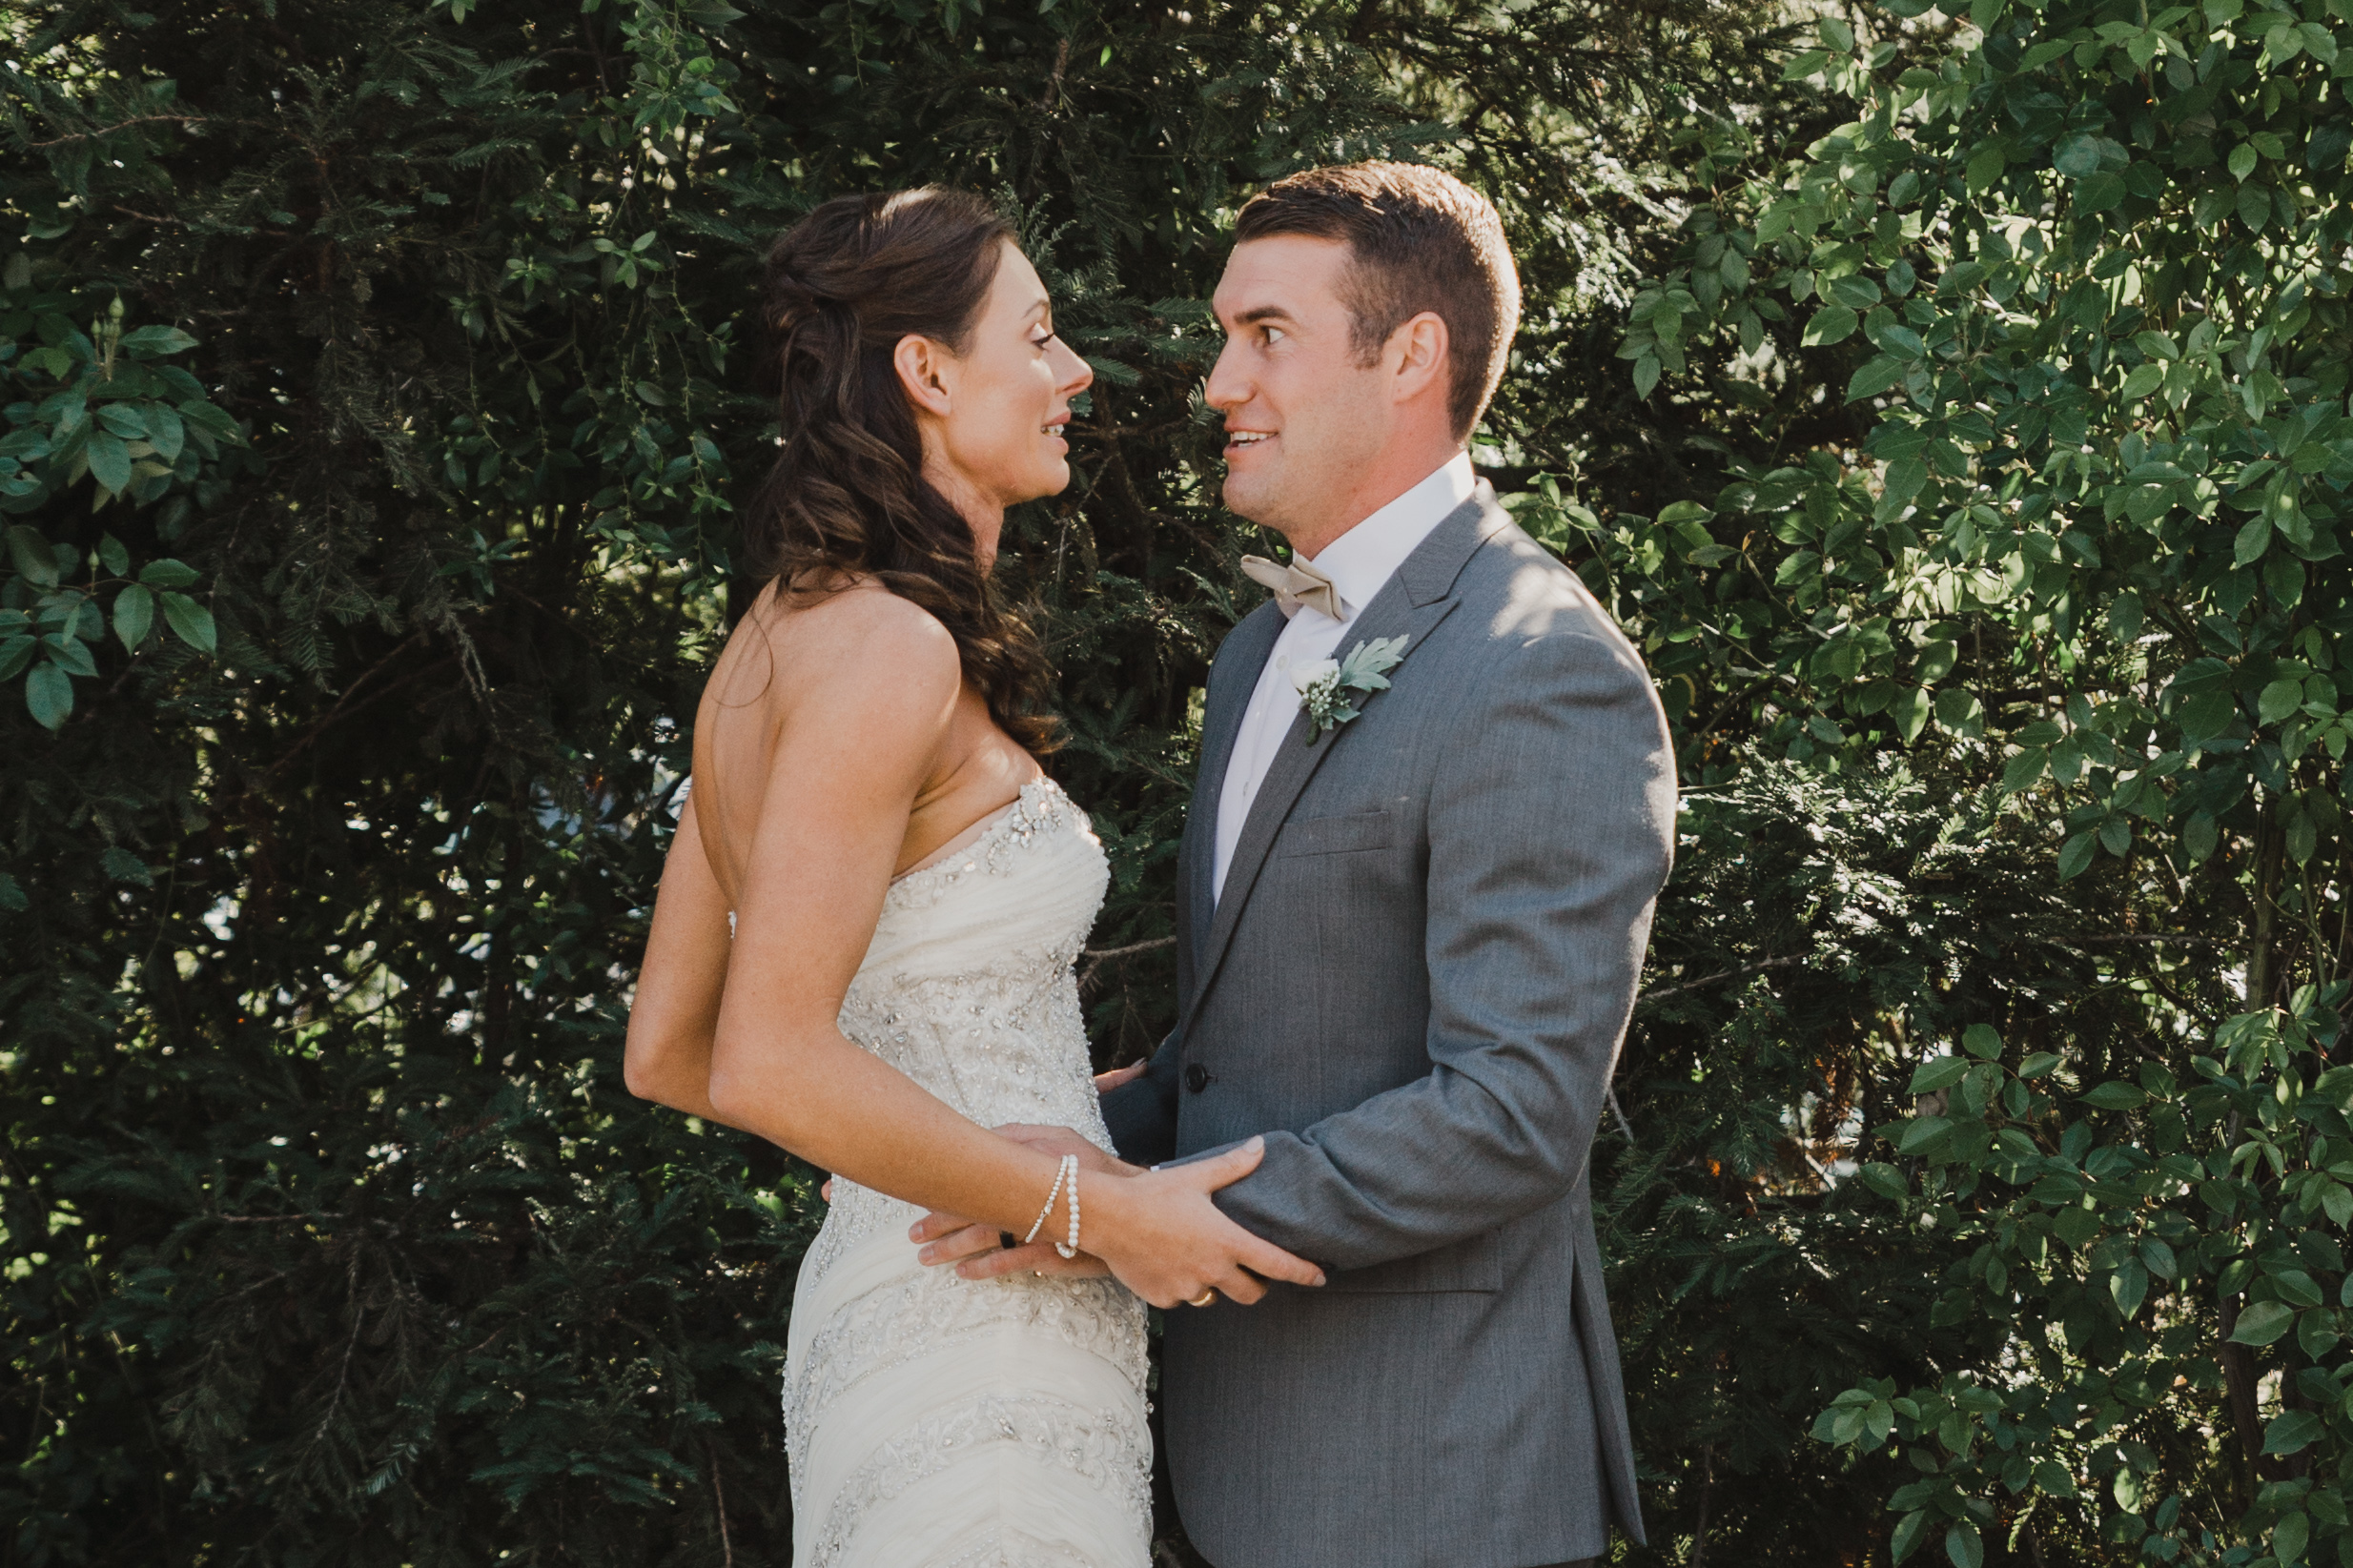 C+J-Grace-Maralyn-Estate-Wedding-Diana-Lake-Photography411.jpg